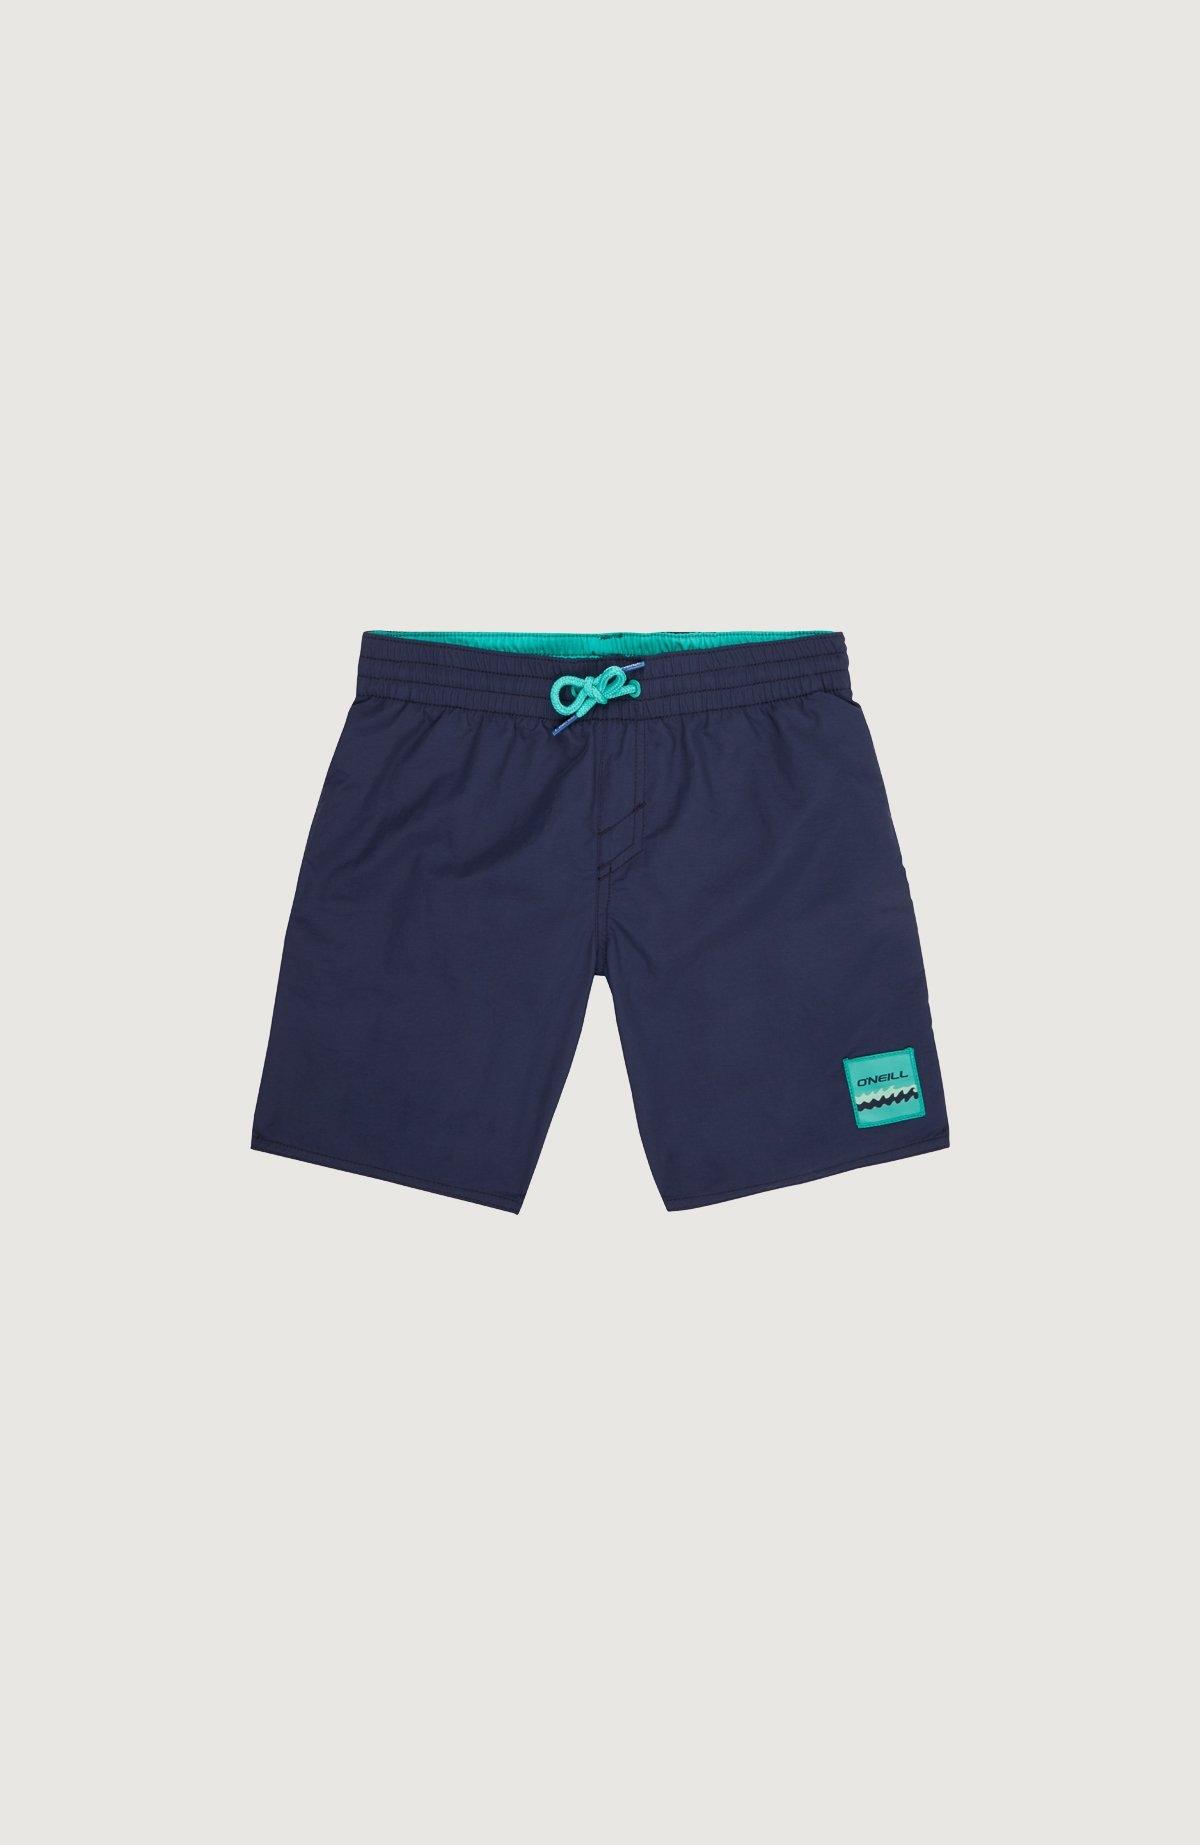 O'neill Zwemshort, O' Neill voordelig en veilig online kopen